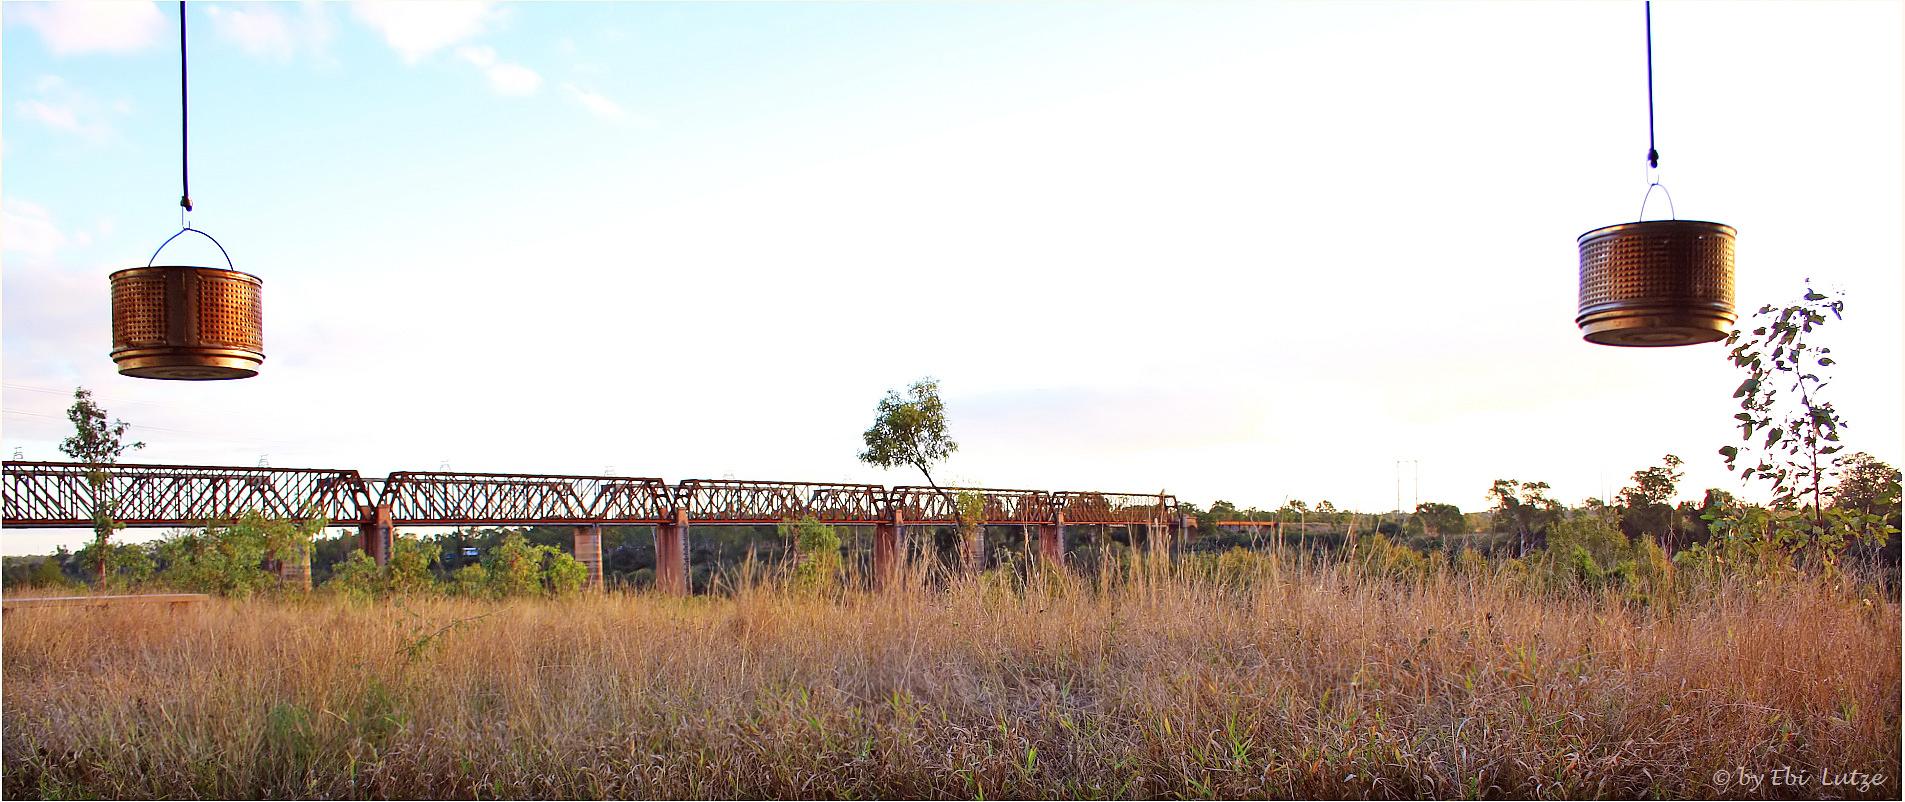 *** Mosquito Defence / Burdekin River Qld.